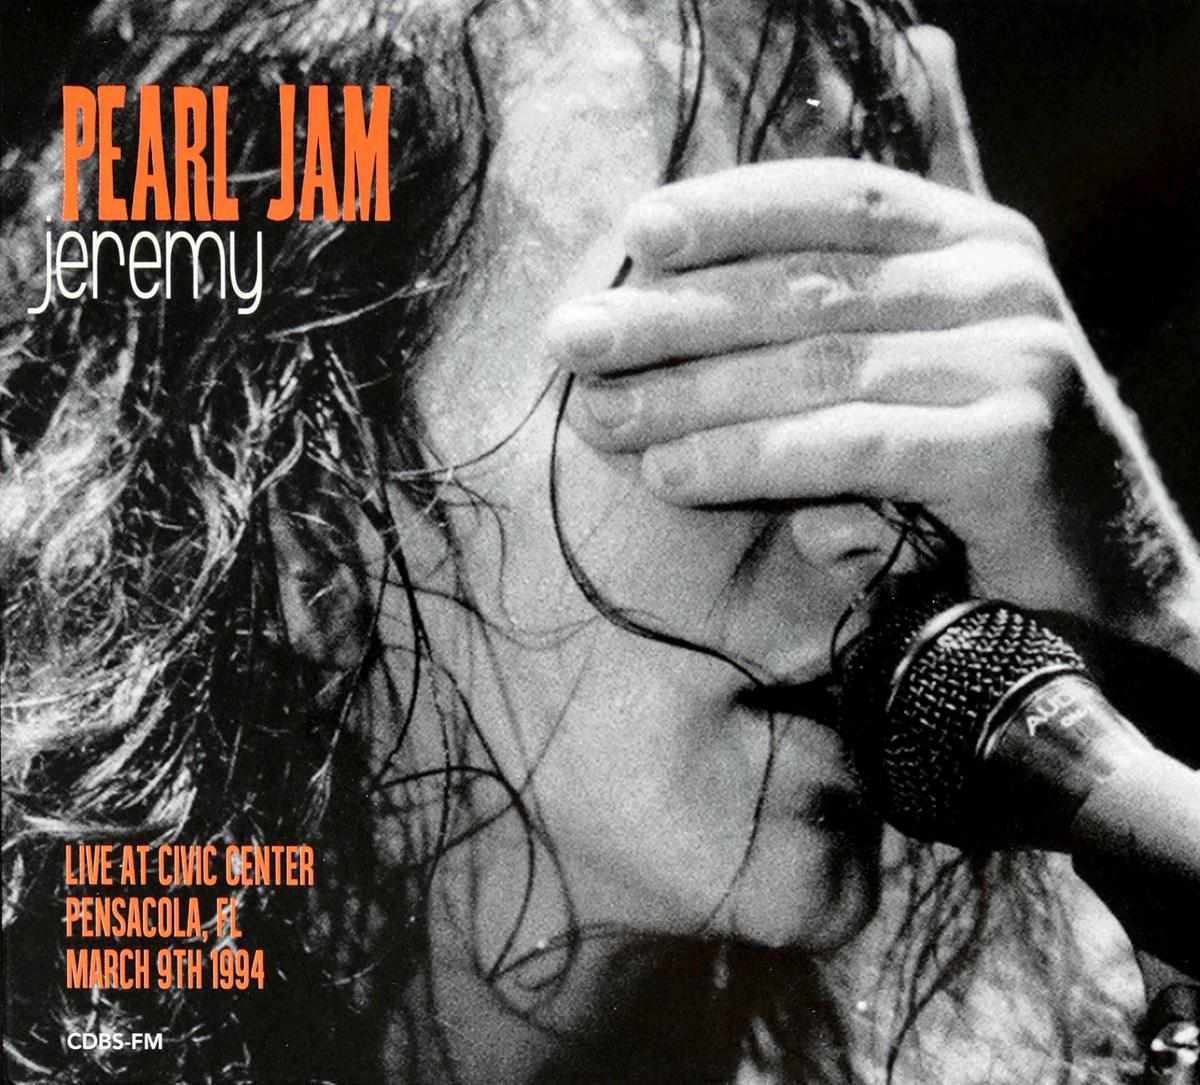 Pearl Jam Pearl Jam. Jeremy: Live At Civic Center pearl jam pearl jam lightning bolt